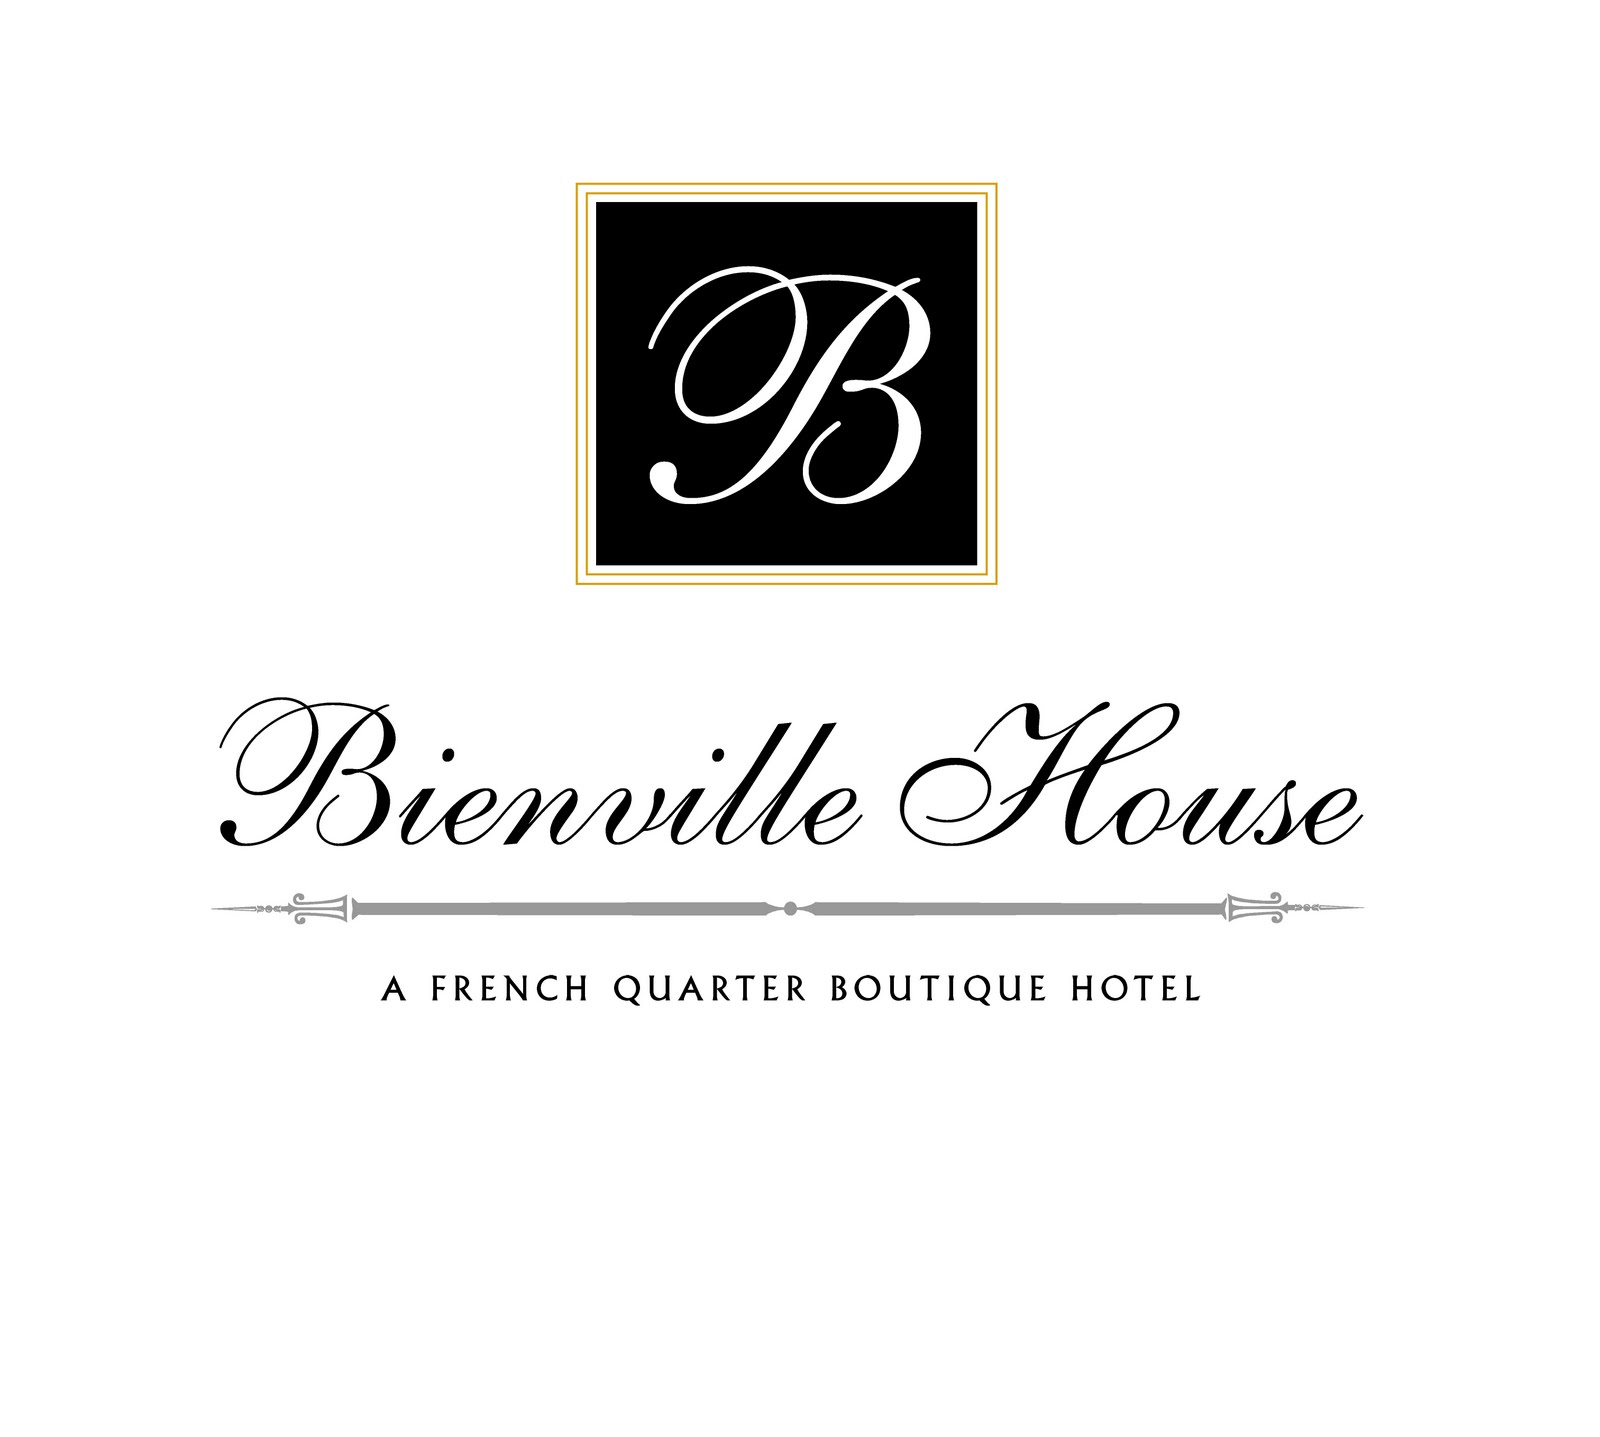 [bienville+house+logo]